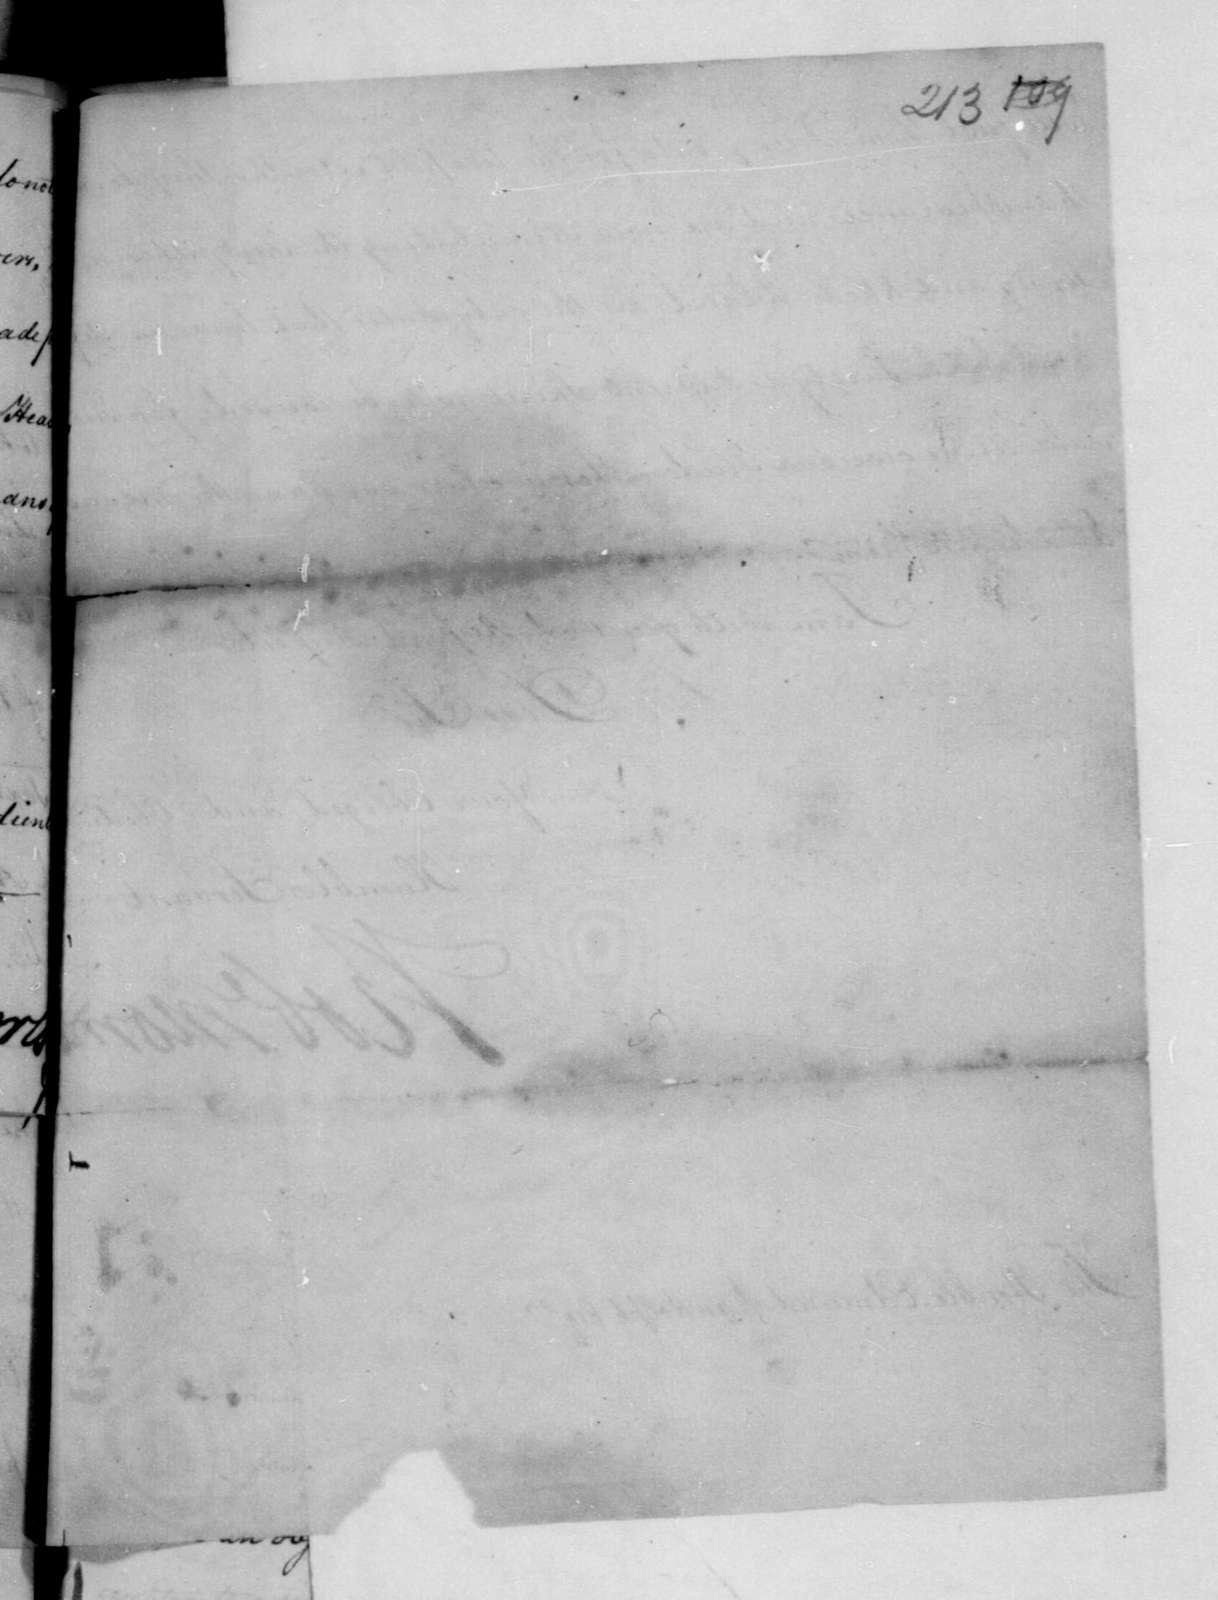 Robert Morris to Edmund Randolph, June 11, 1782. Includes typed transcription.